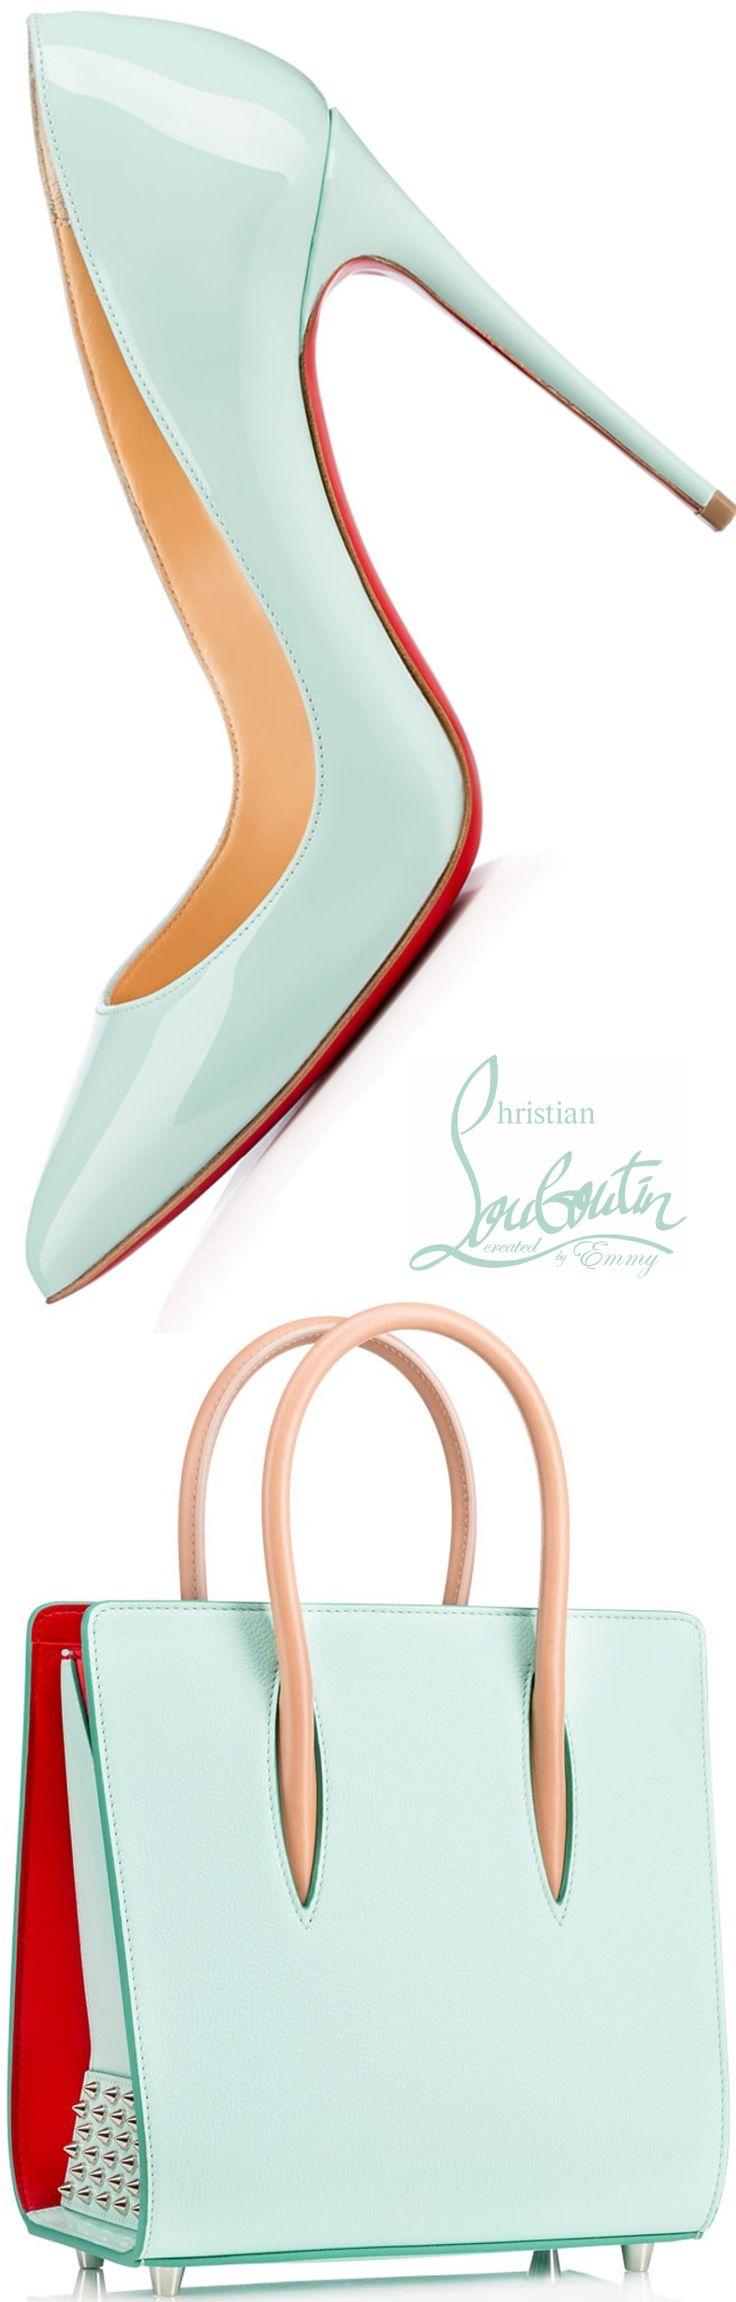 Christian Louboutin Pigalle Follies Patent Pumps  Paloma Small Tote Bag #christianlouboutinhandbags